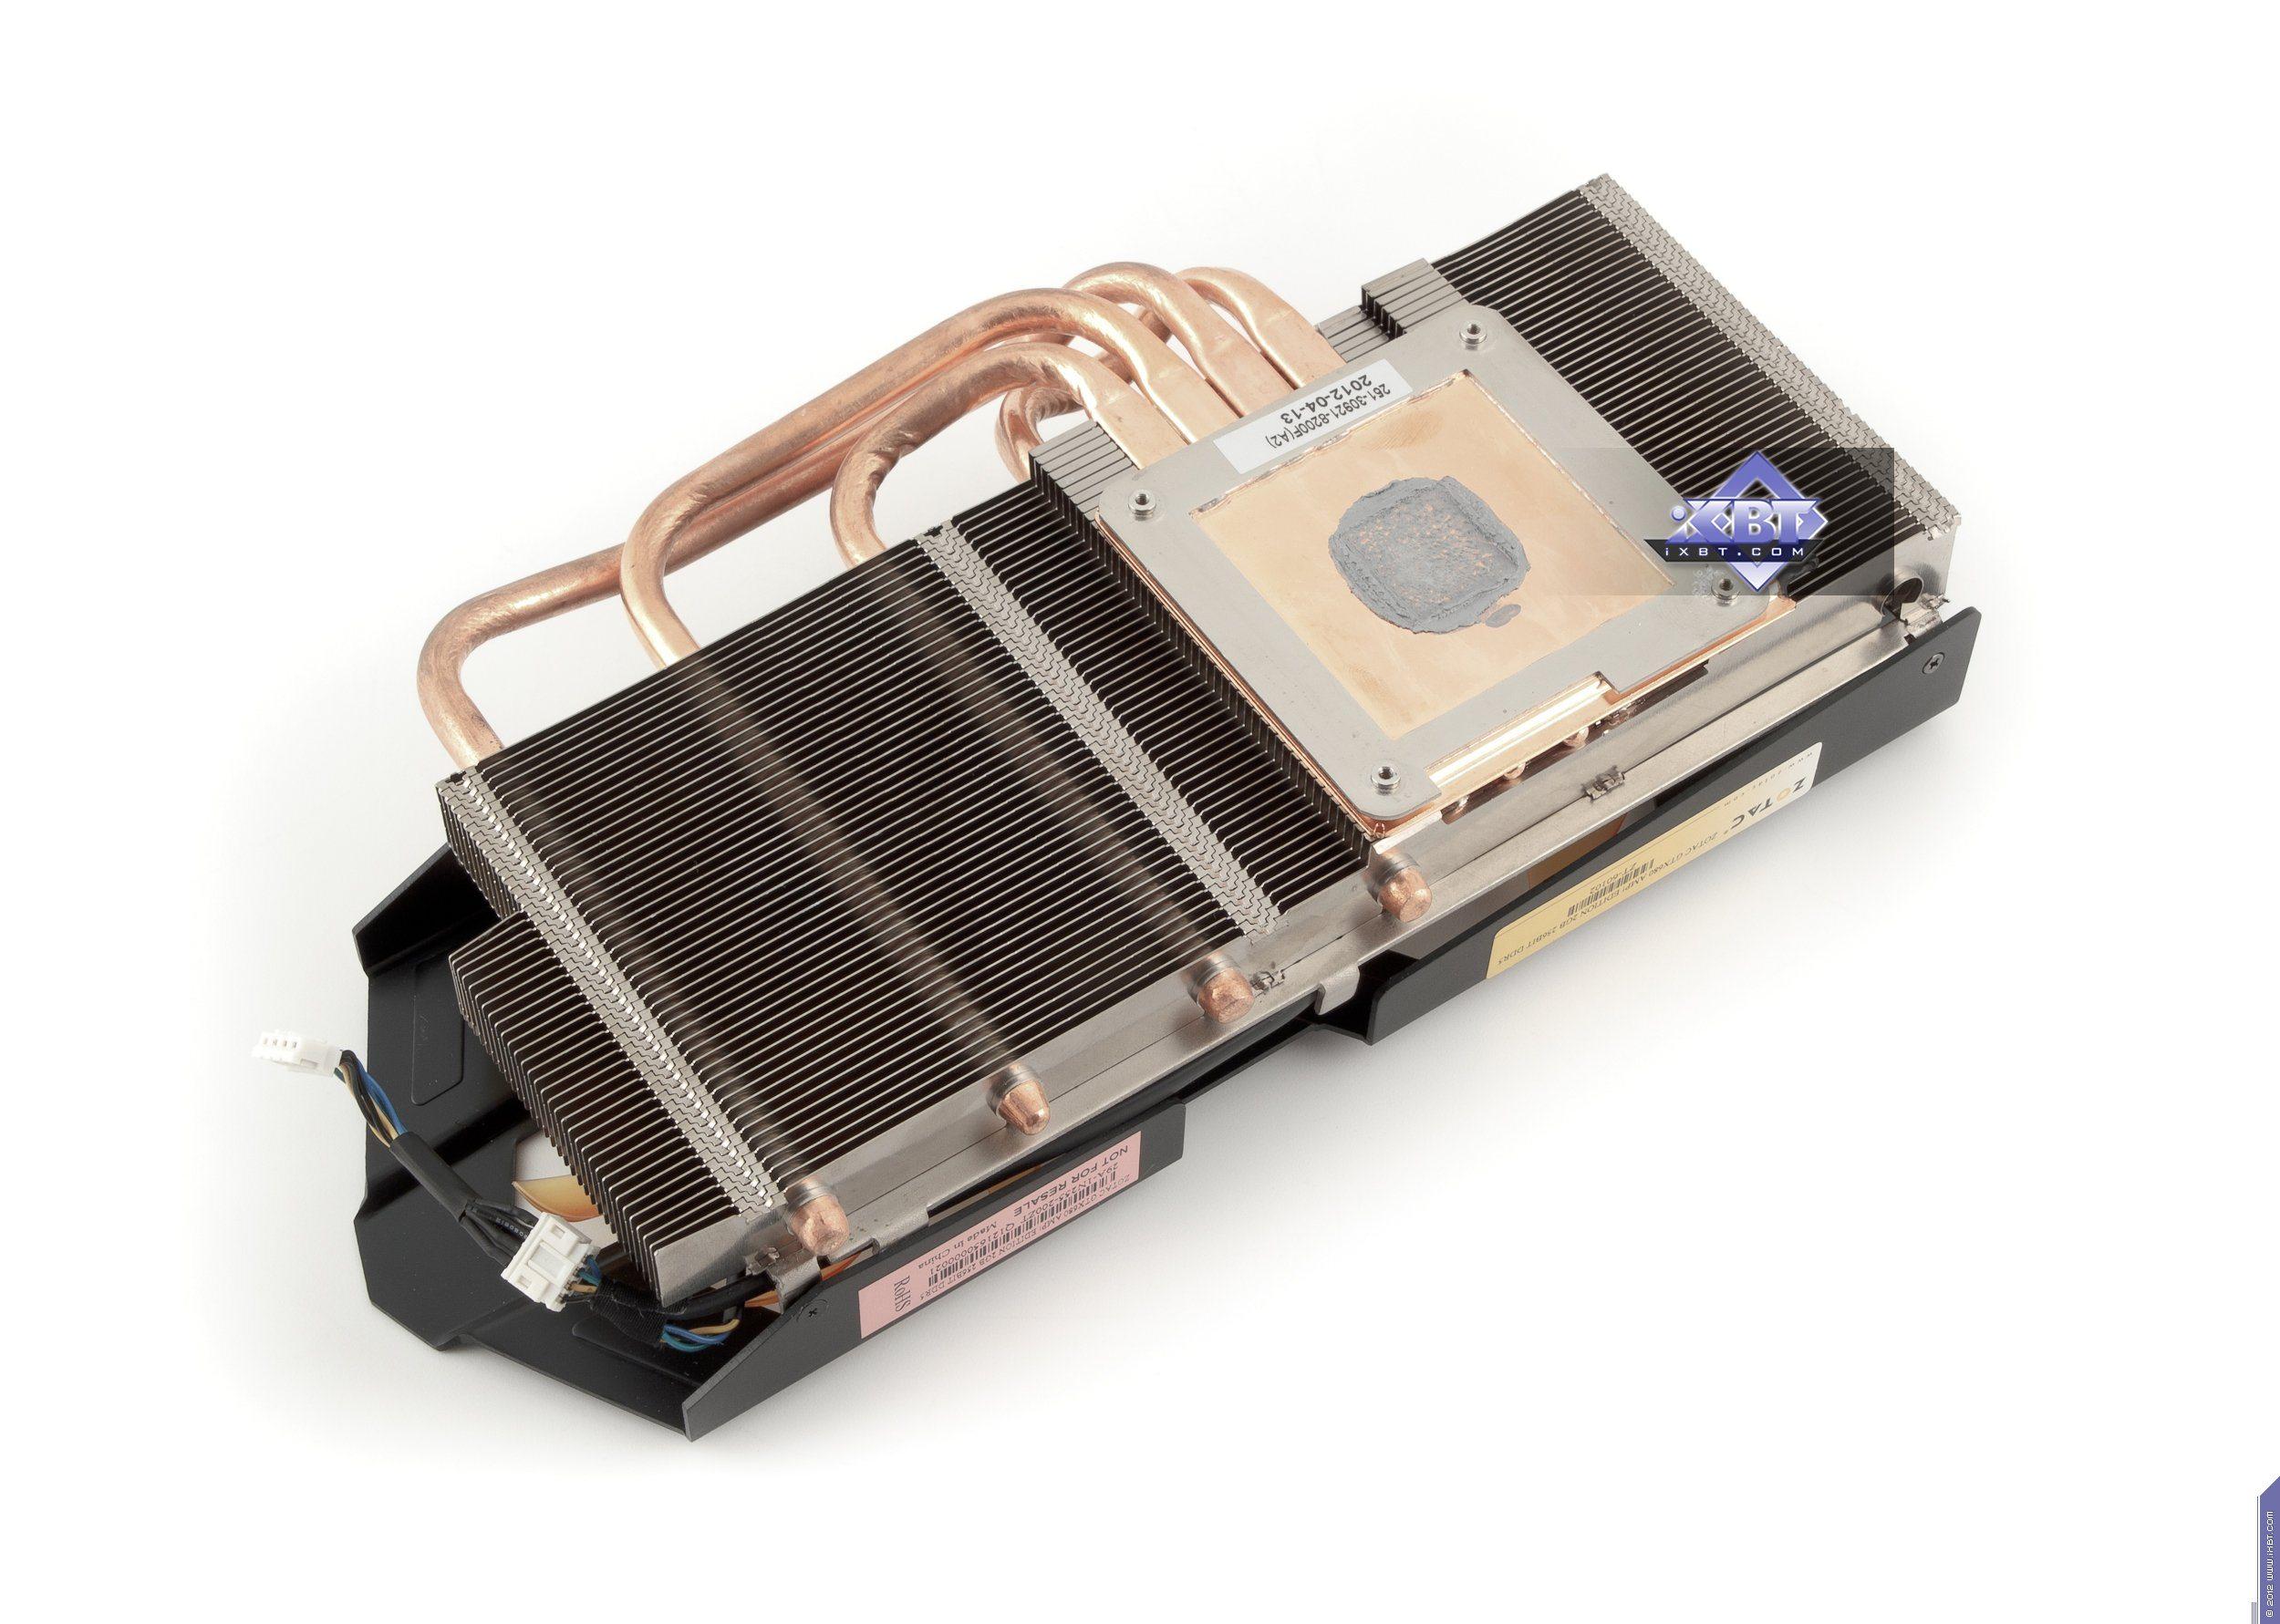 ... GTX 680 Phantom, Zotac GeForce GTX 680 AMP! Edition Graphics Cards